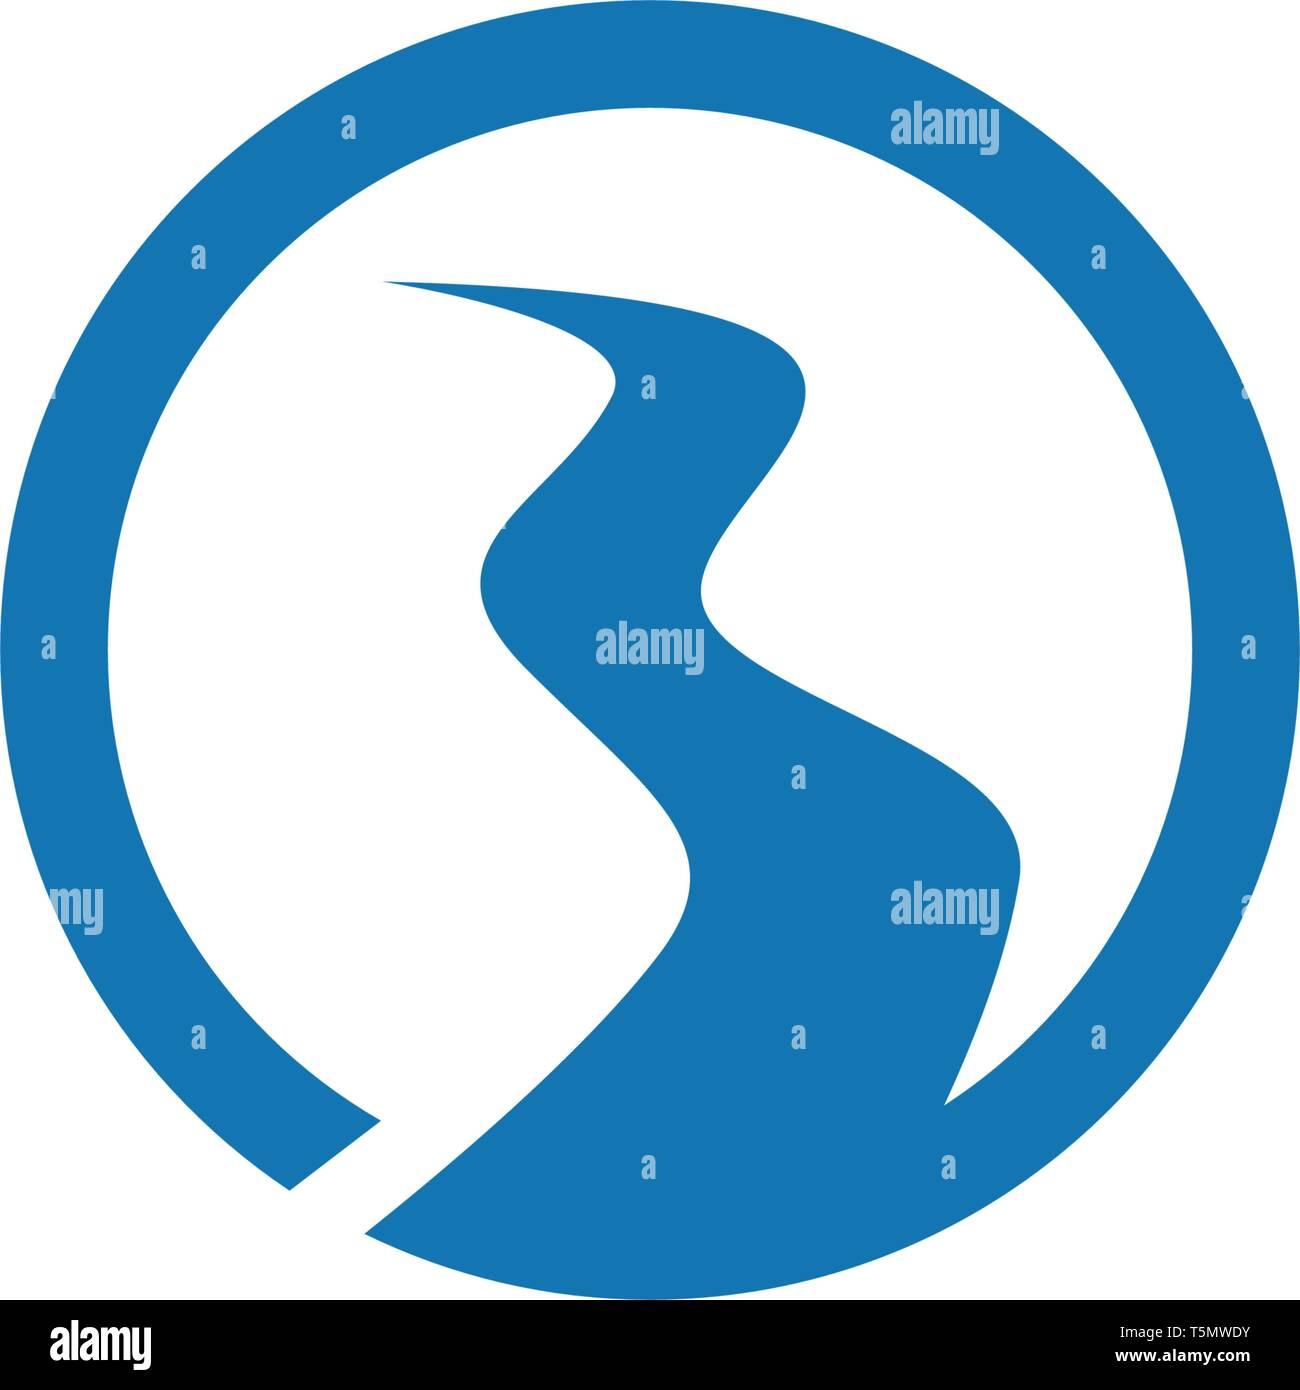 river vector icon illustration design stock vector image art alamy https www alamy com river vector icon illustration design image244477463 html